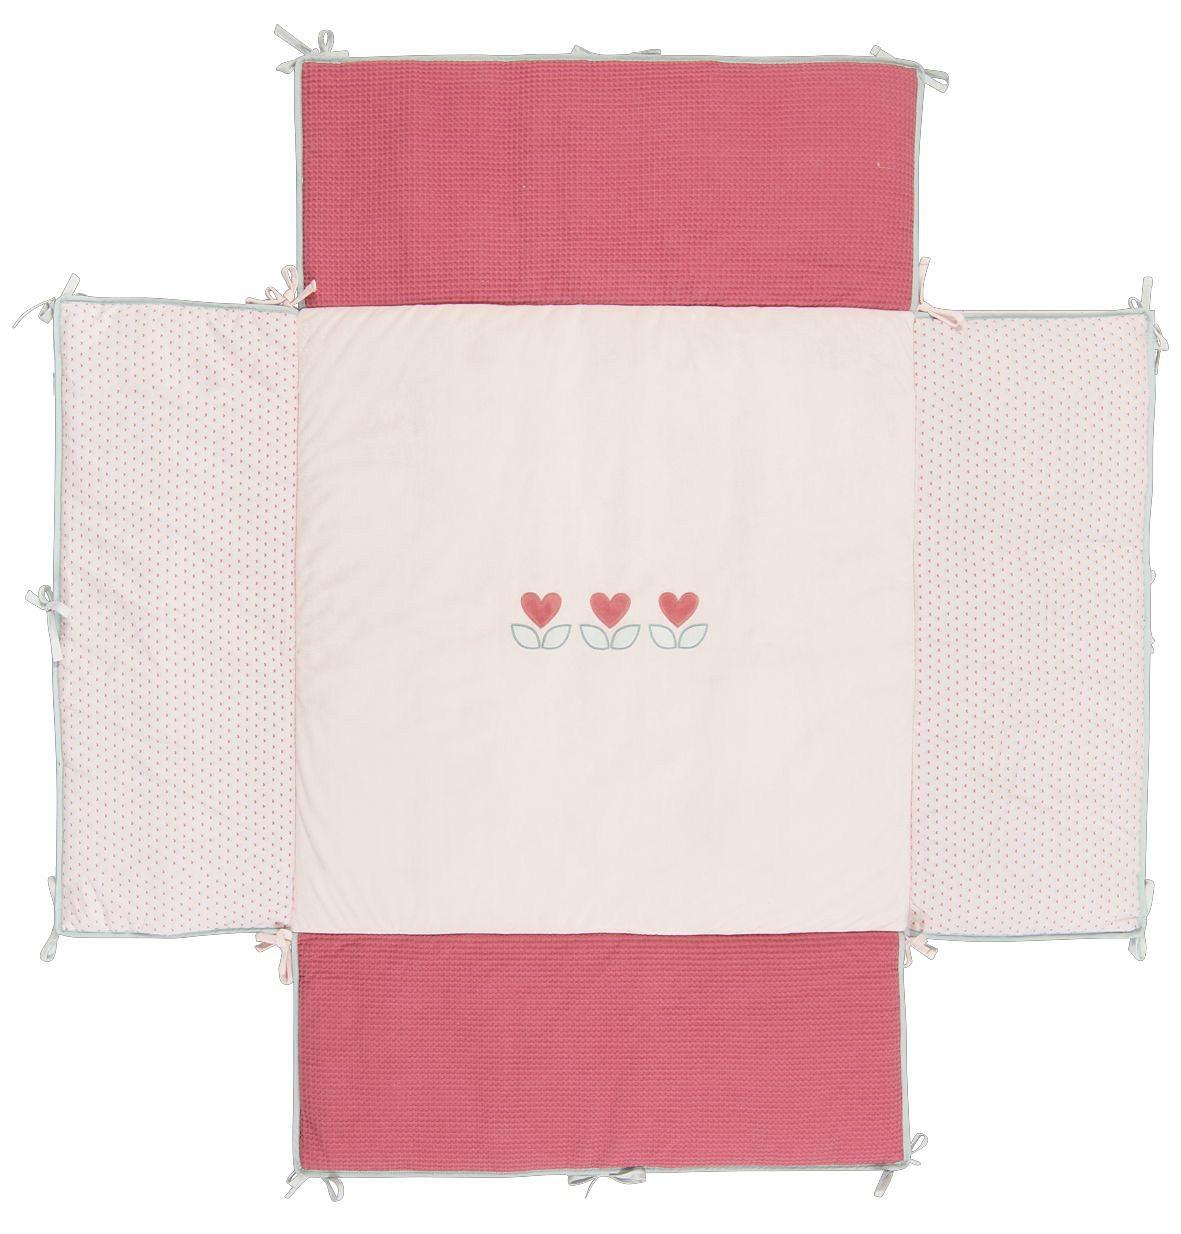 NATTOU Laufgittereinlage, 100x100 cm rosa